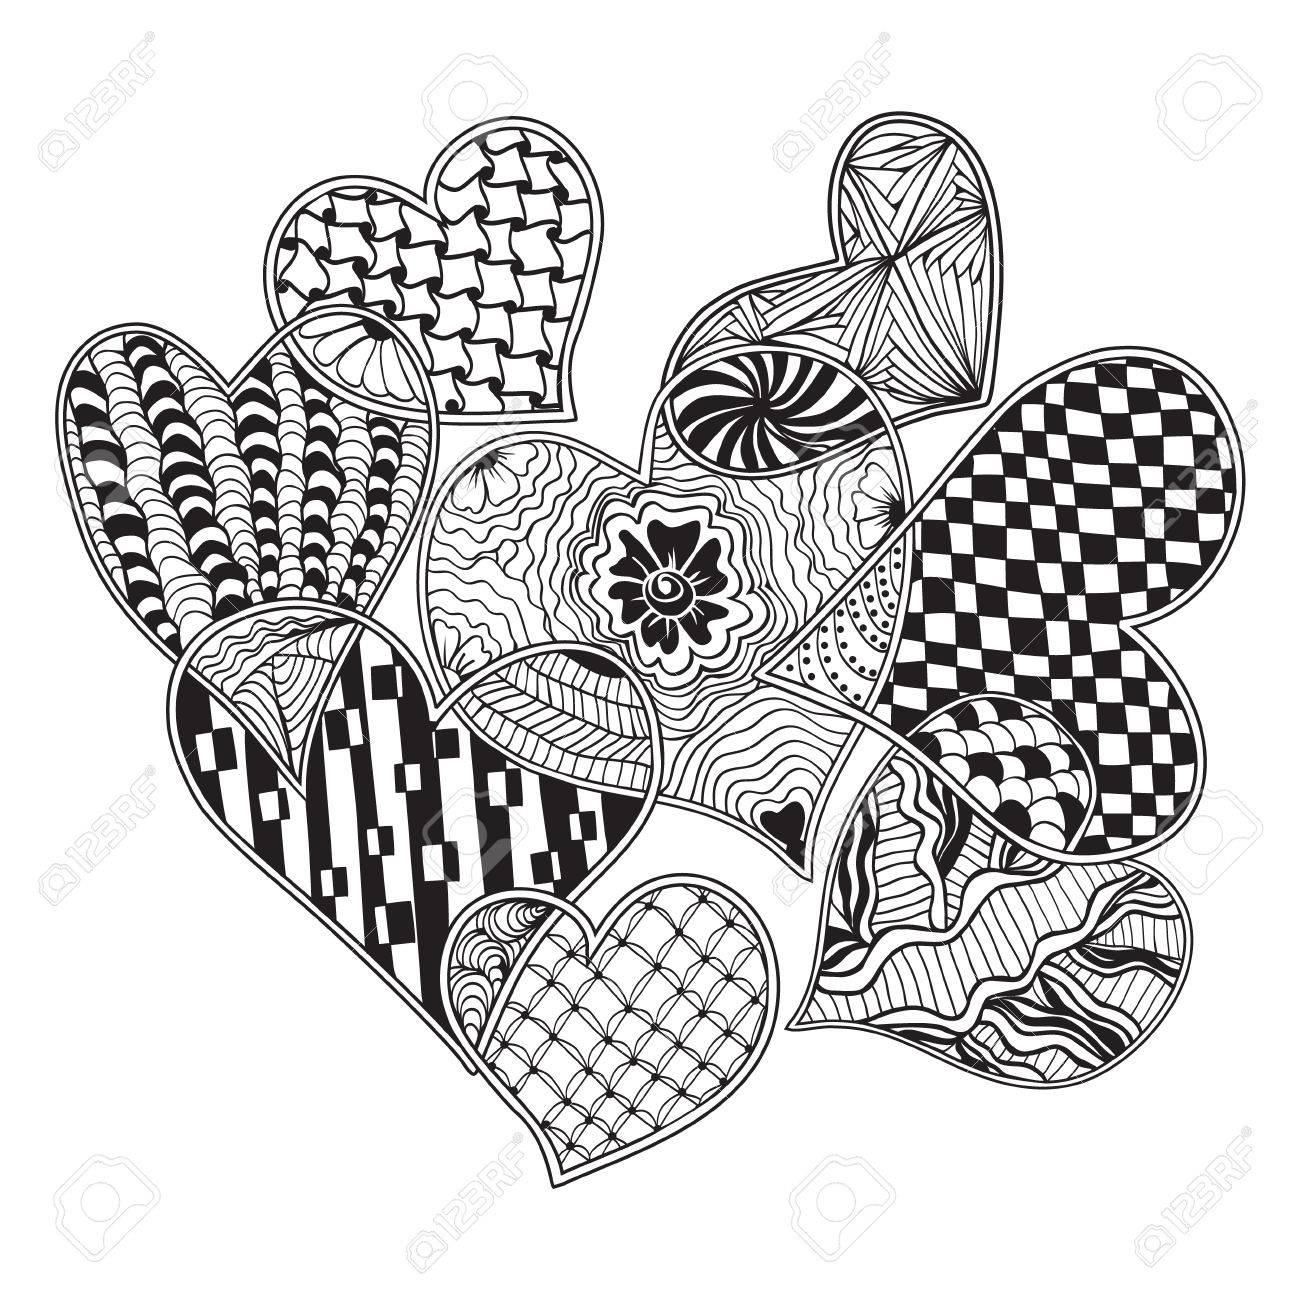 Vector Pattern Of Hearts Ornate Zentangle Style Decorative Symbol